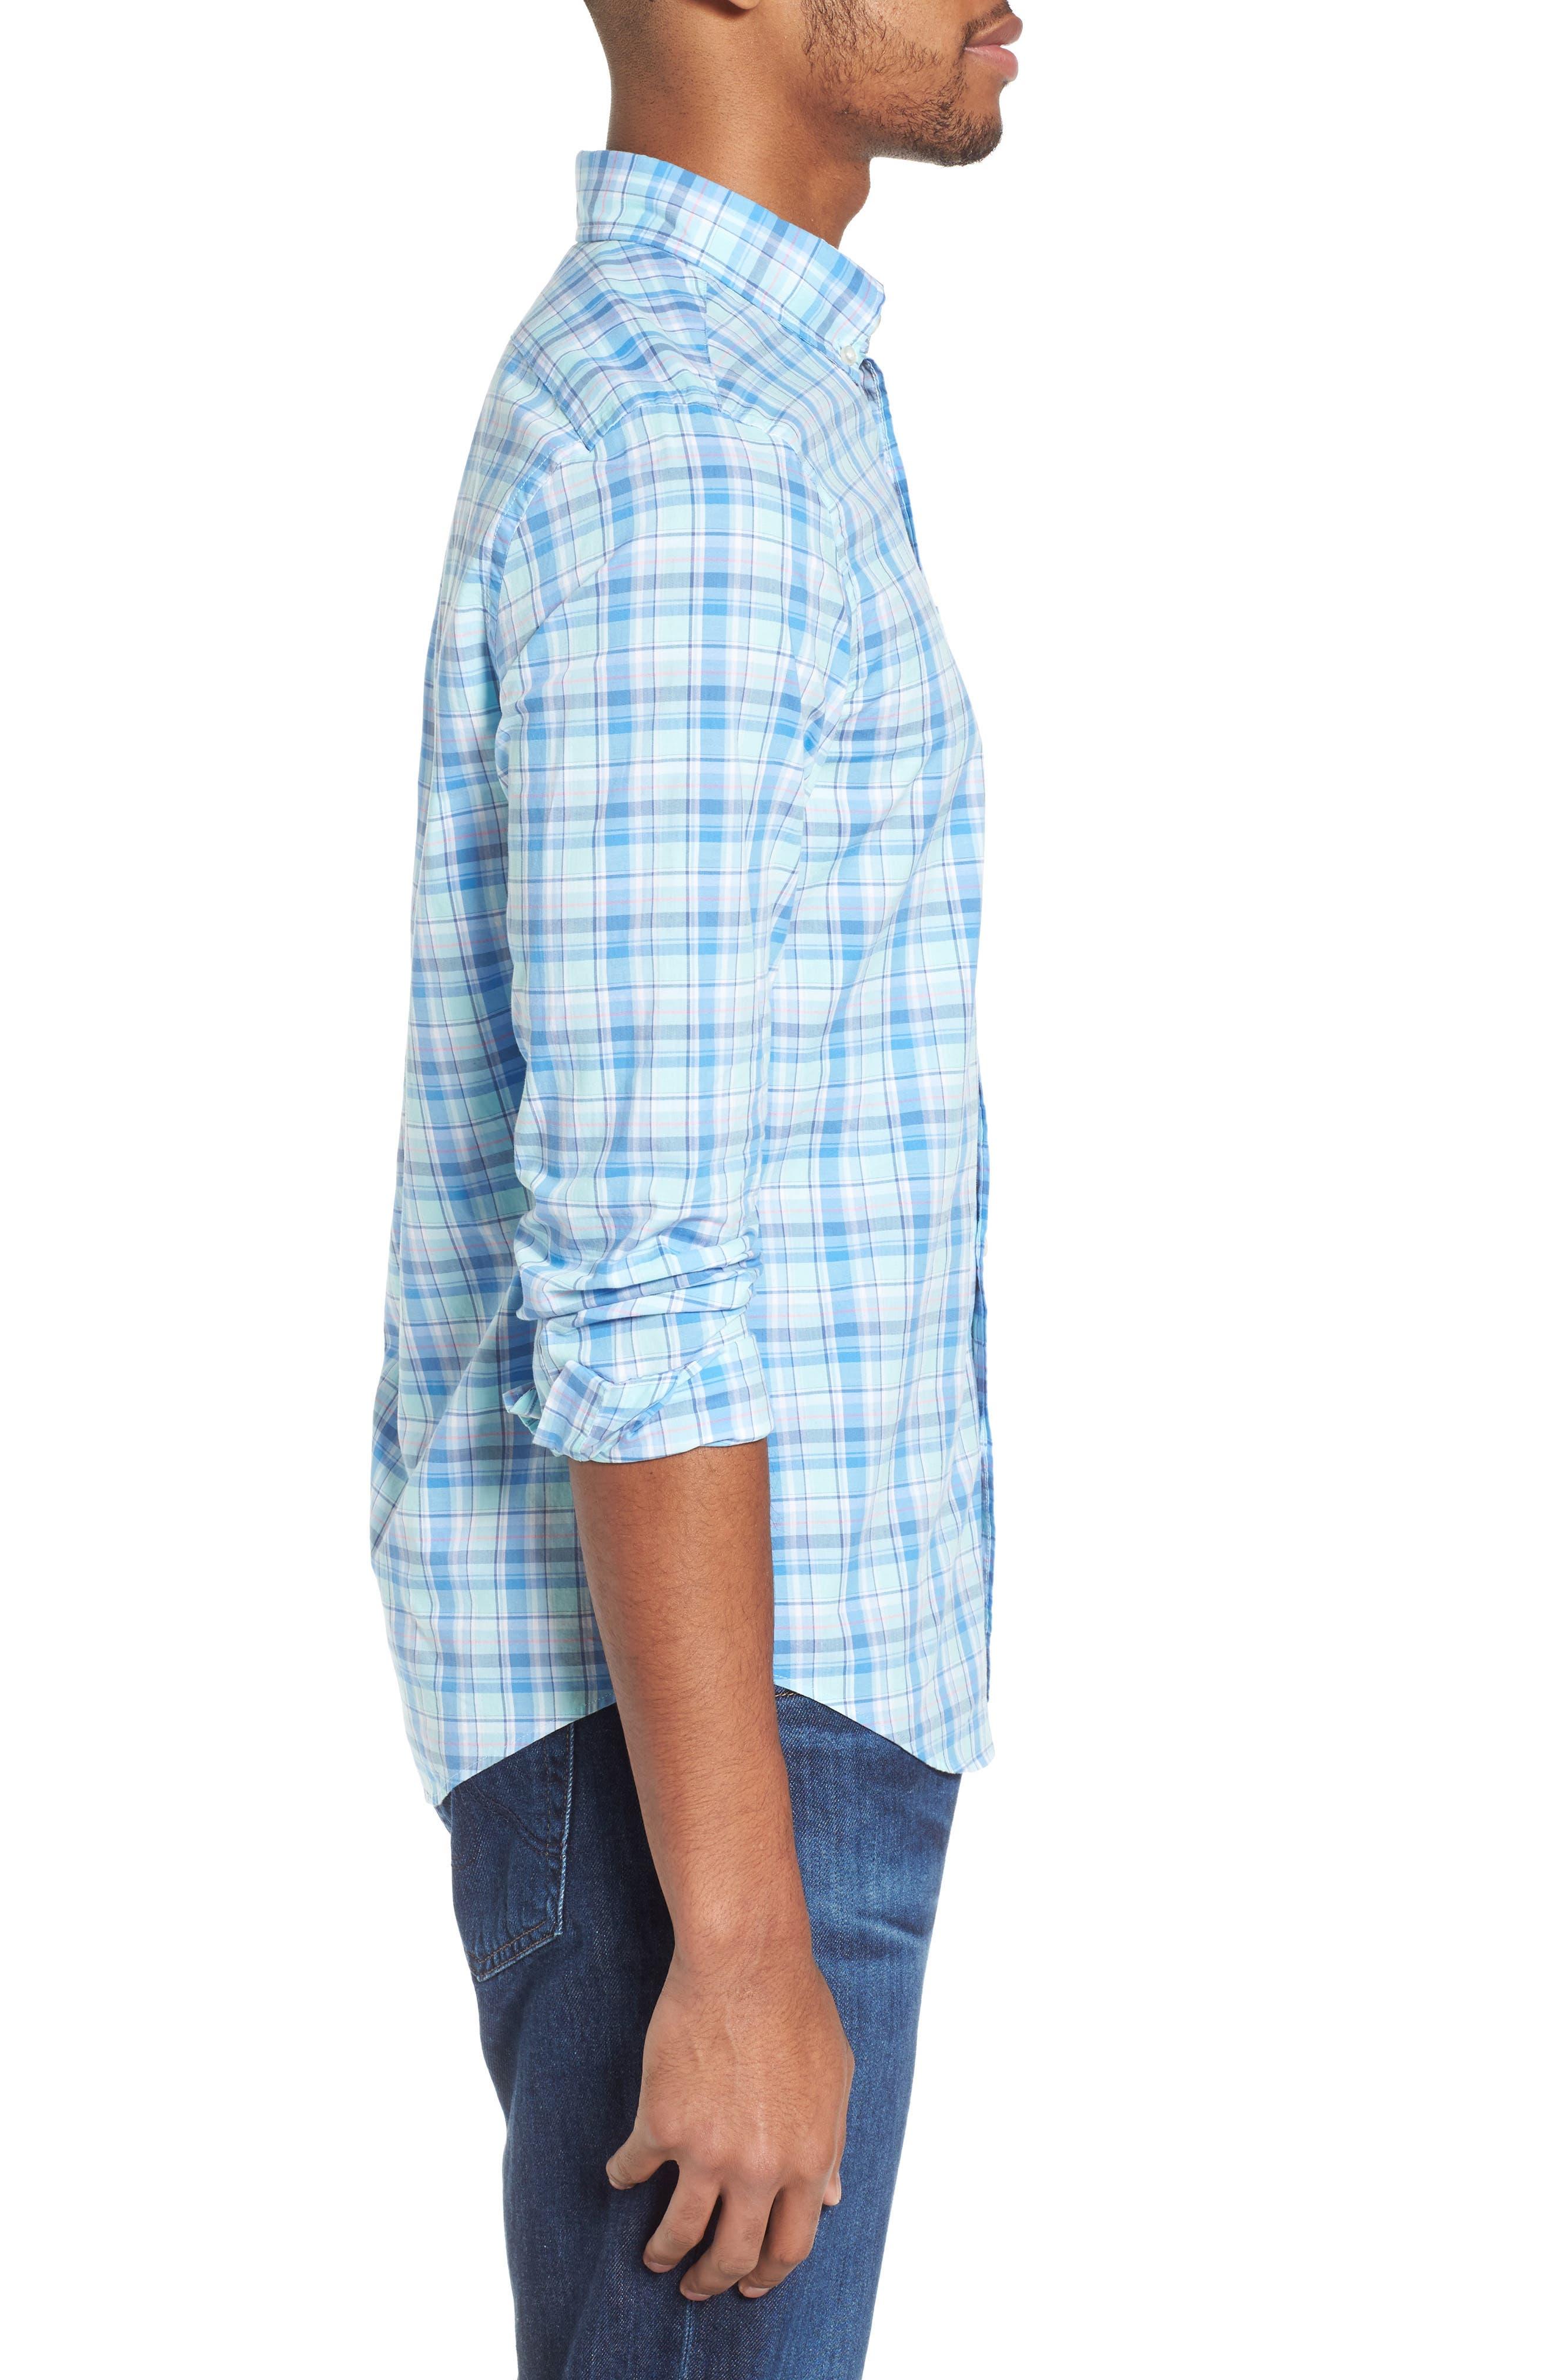 Murray Pine Island Slim Fit Plaid Sport Shirt,                             Alternate thumbnail 3, color,                             422